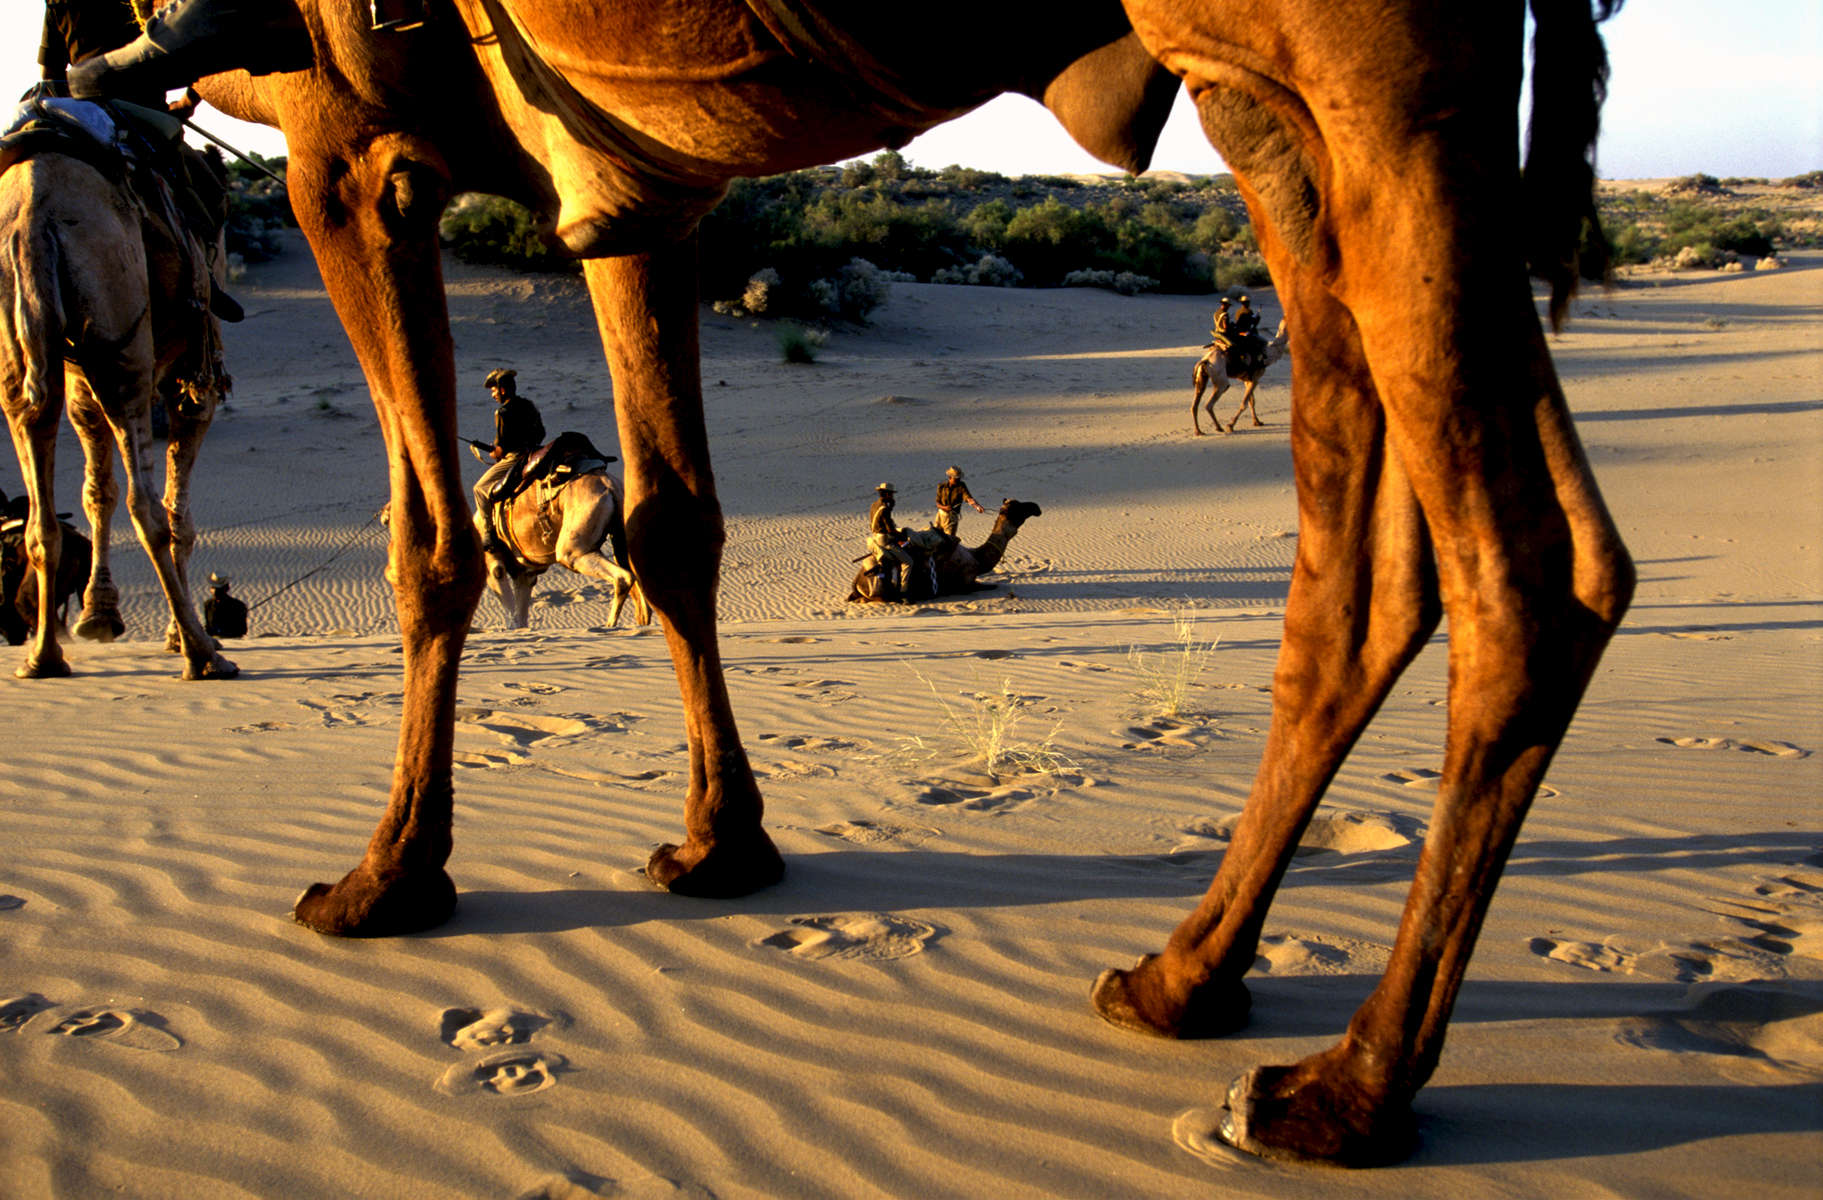 Mounted camel Border Security Force (BSF) patrol along the Indo-Pakistan Thar desert border. 1998